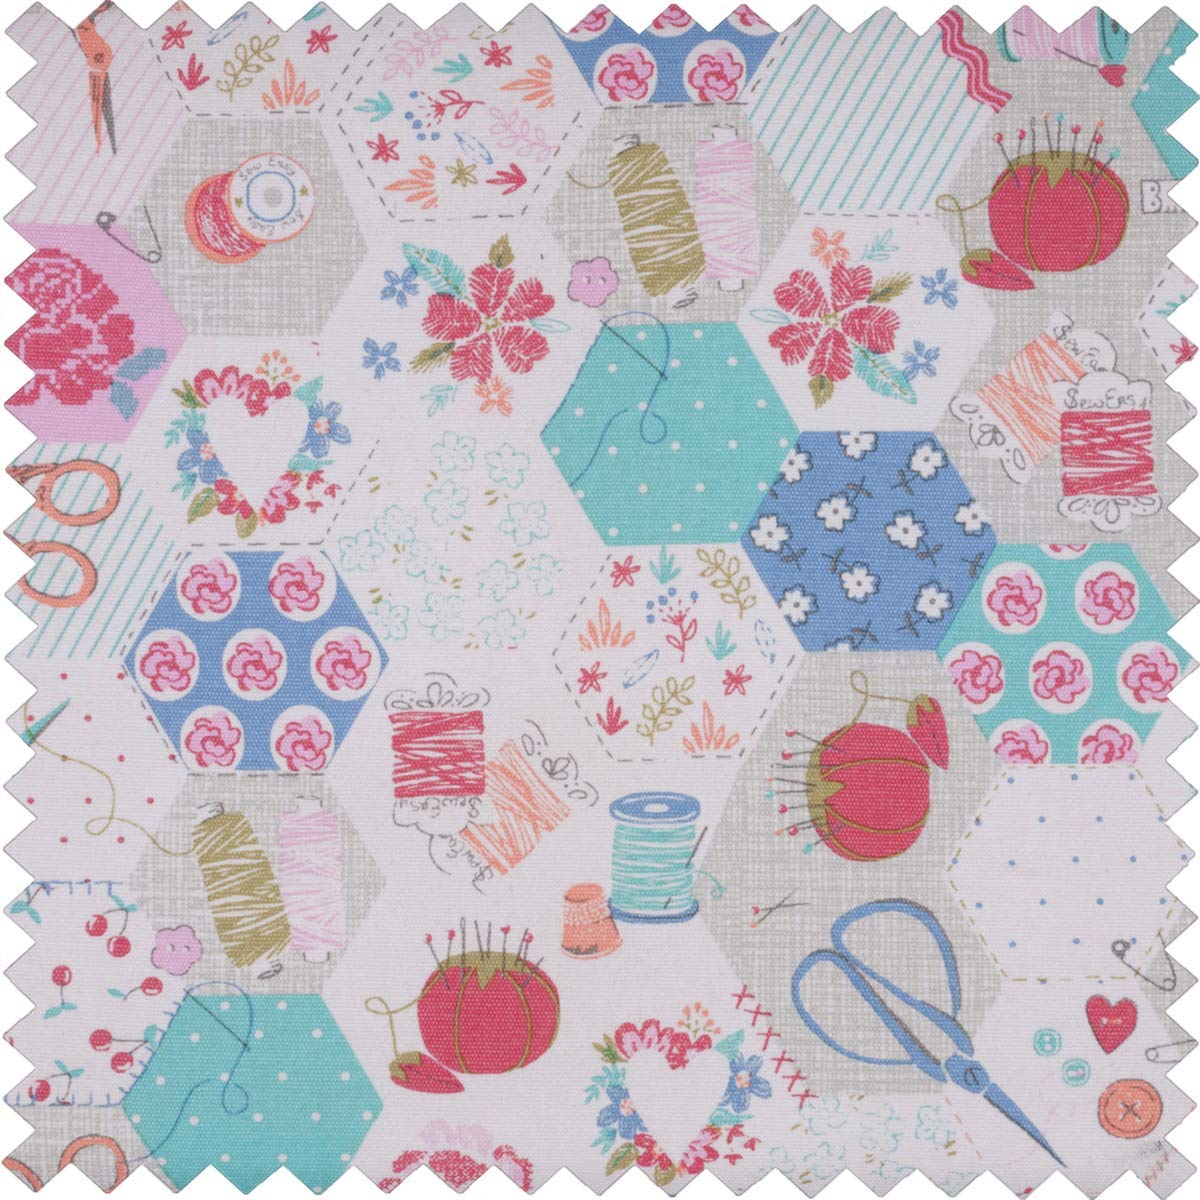 Hobby Gift Notions Matt PVC Print Collection Sewing Machine Bag